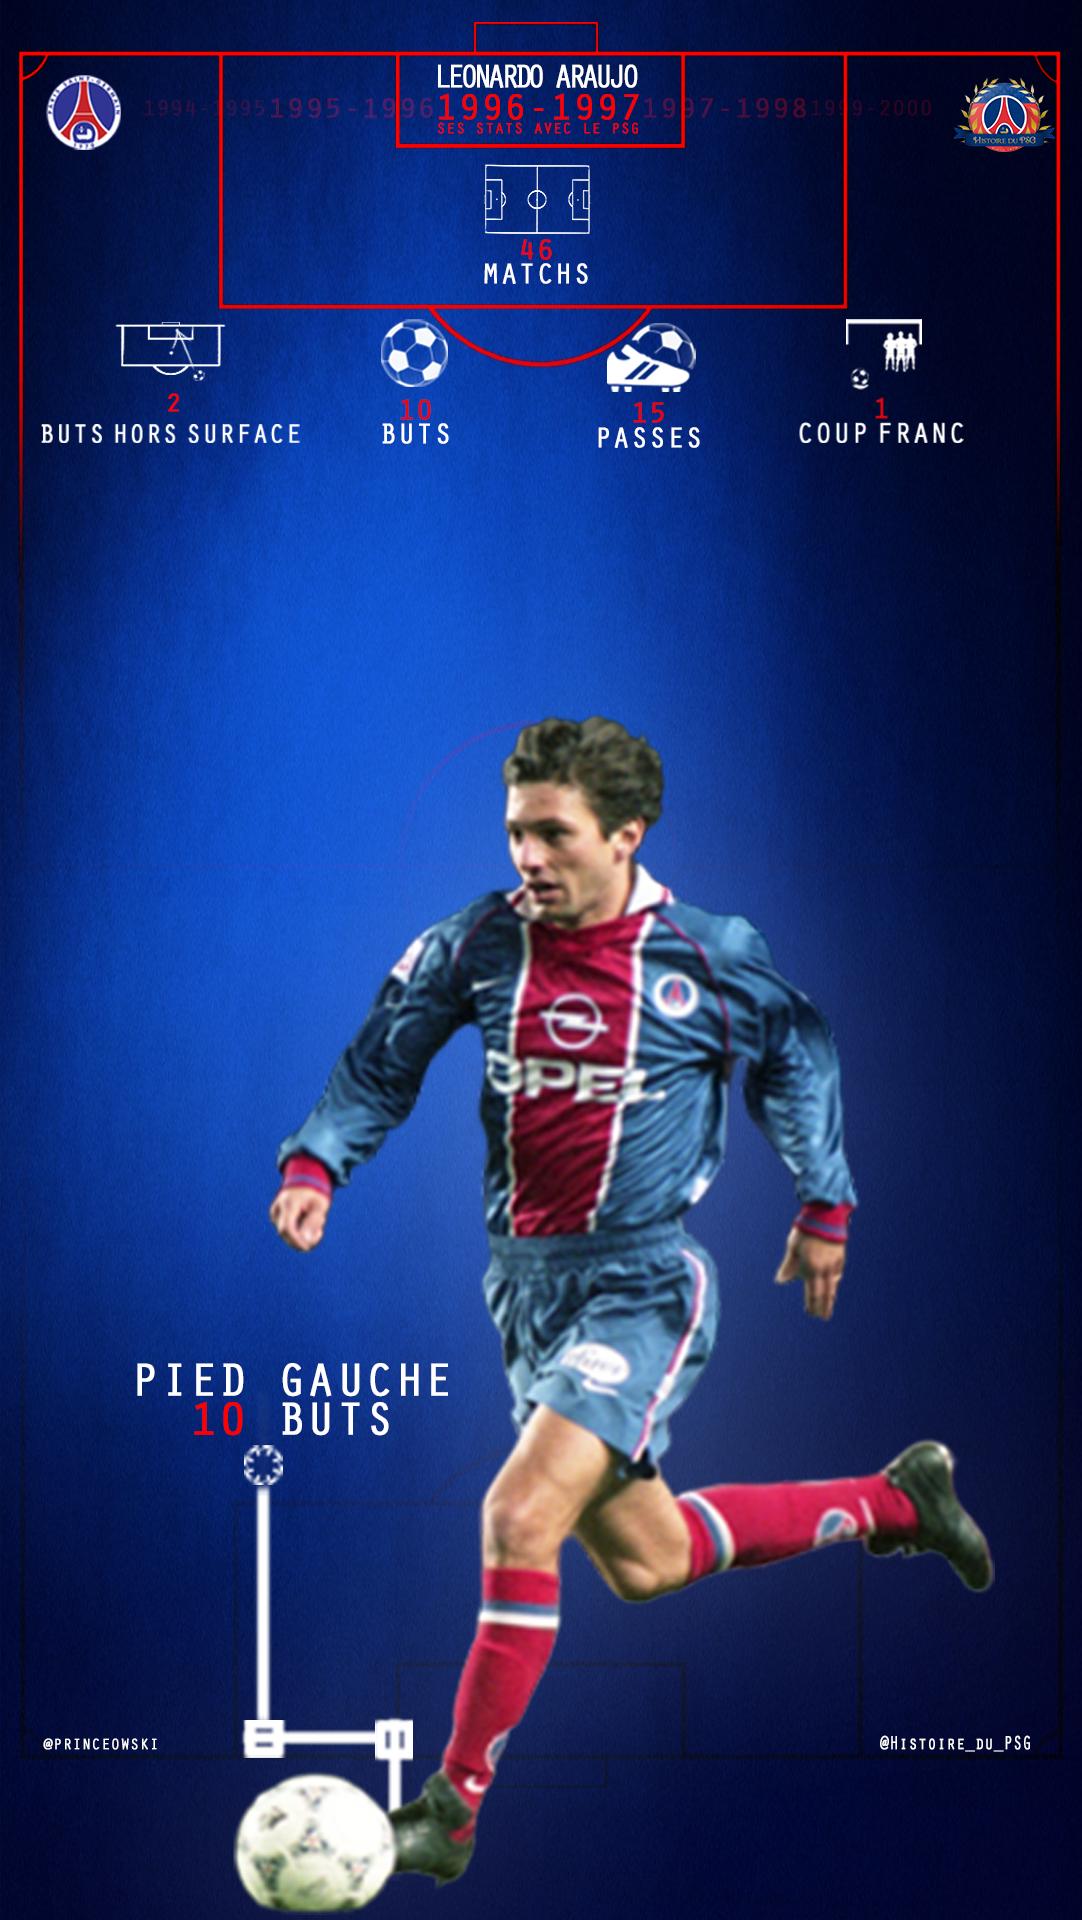 Fond-d'ecran-stat-joueur-PSG-Leonardo